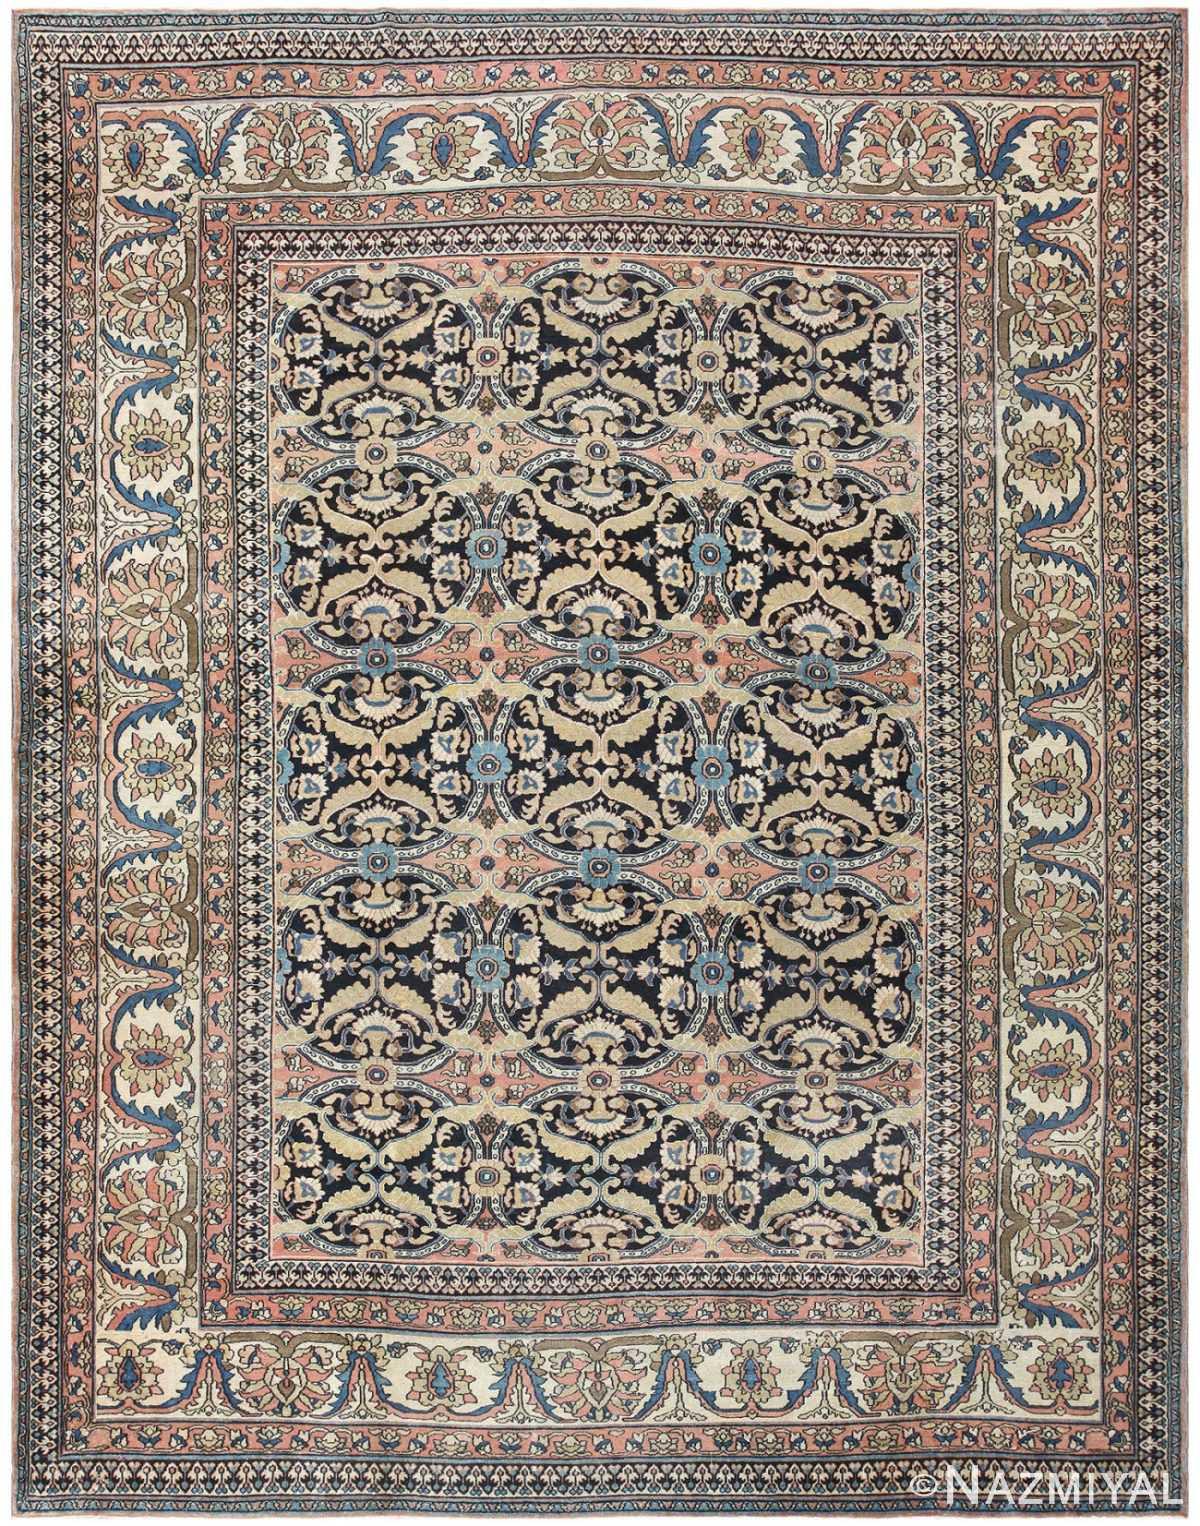 Antique Persian Khorassan Rug 50151 Detail/Large View